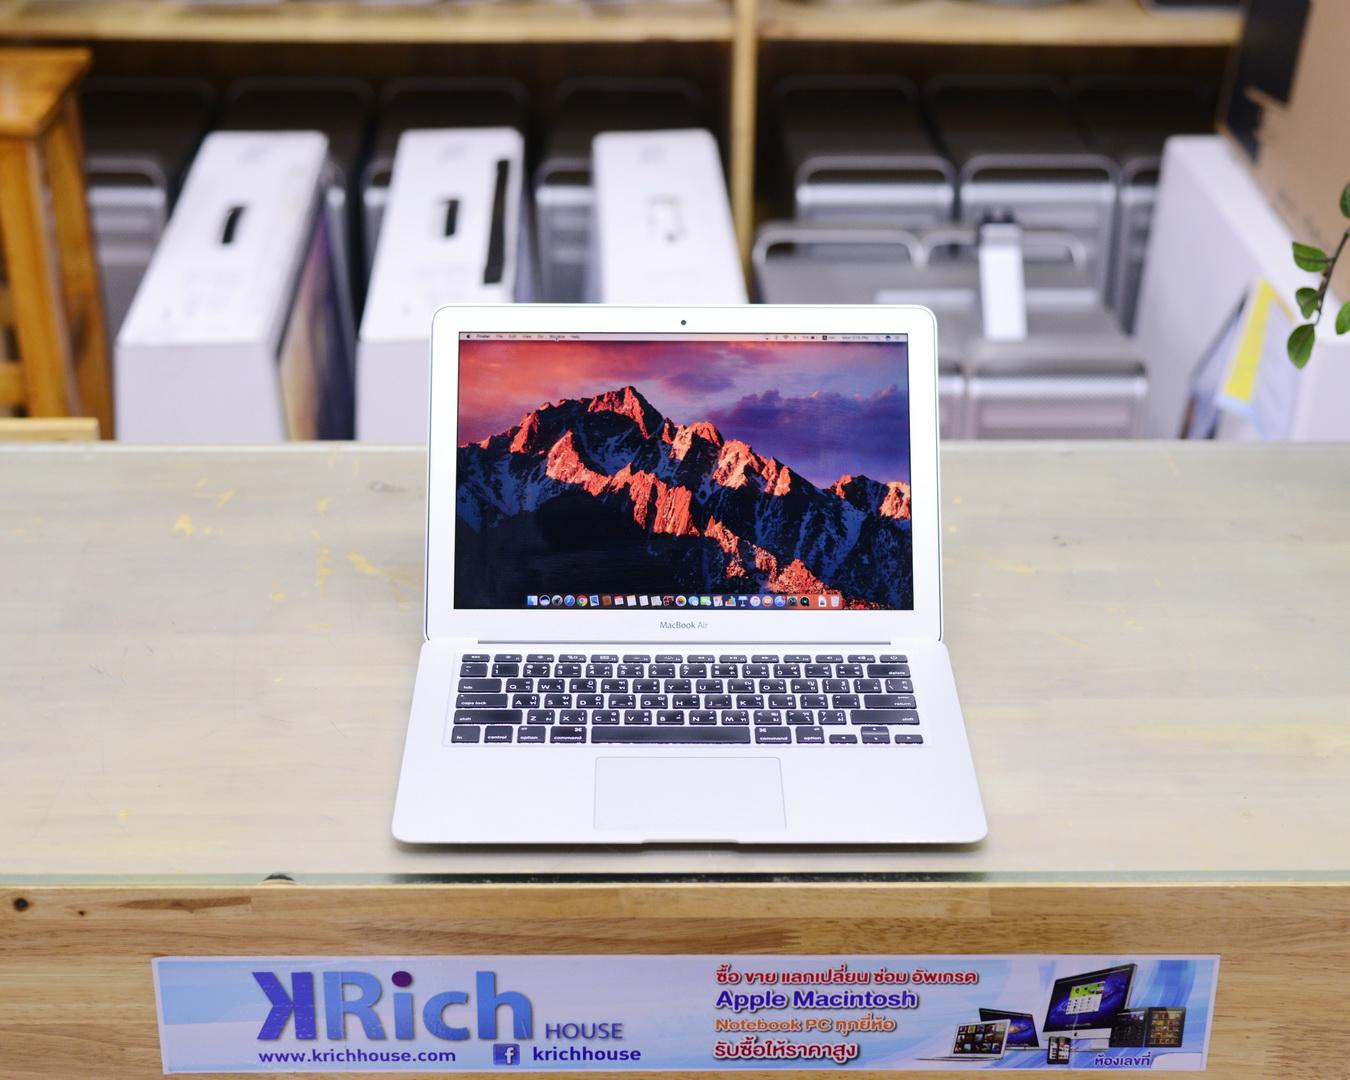 MacBook Air (13-inch, Mid 2013) - Core i5 1.3GHz RAM 4GB SSD 128GB